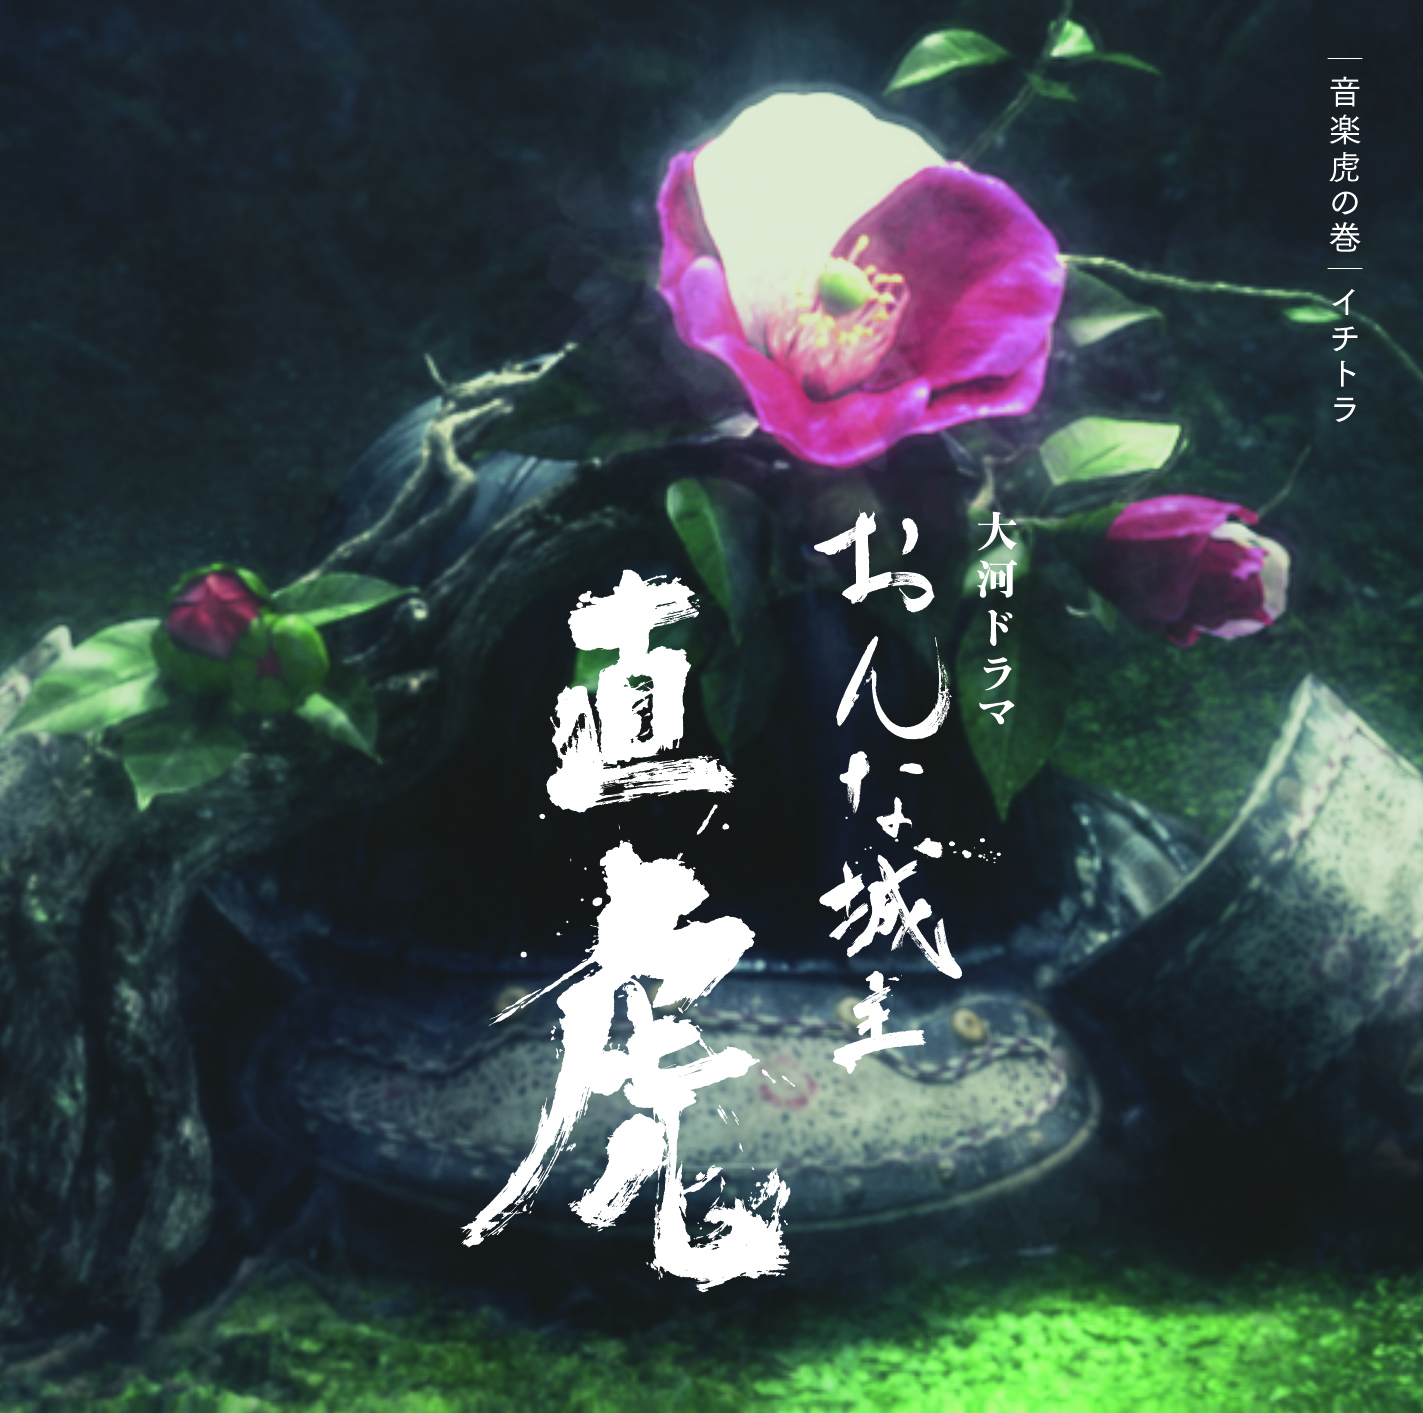 NHK大河ドラマ「おんな城主 直虎」音楽虎の巻 イチトラ